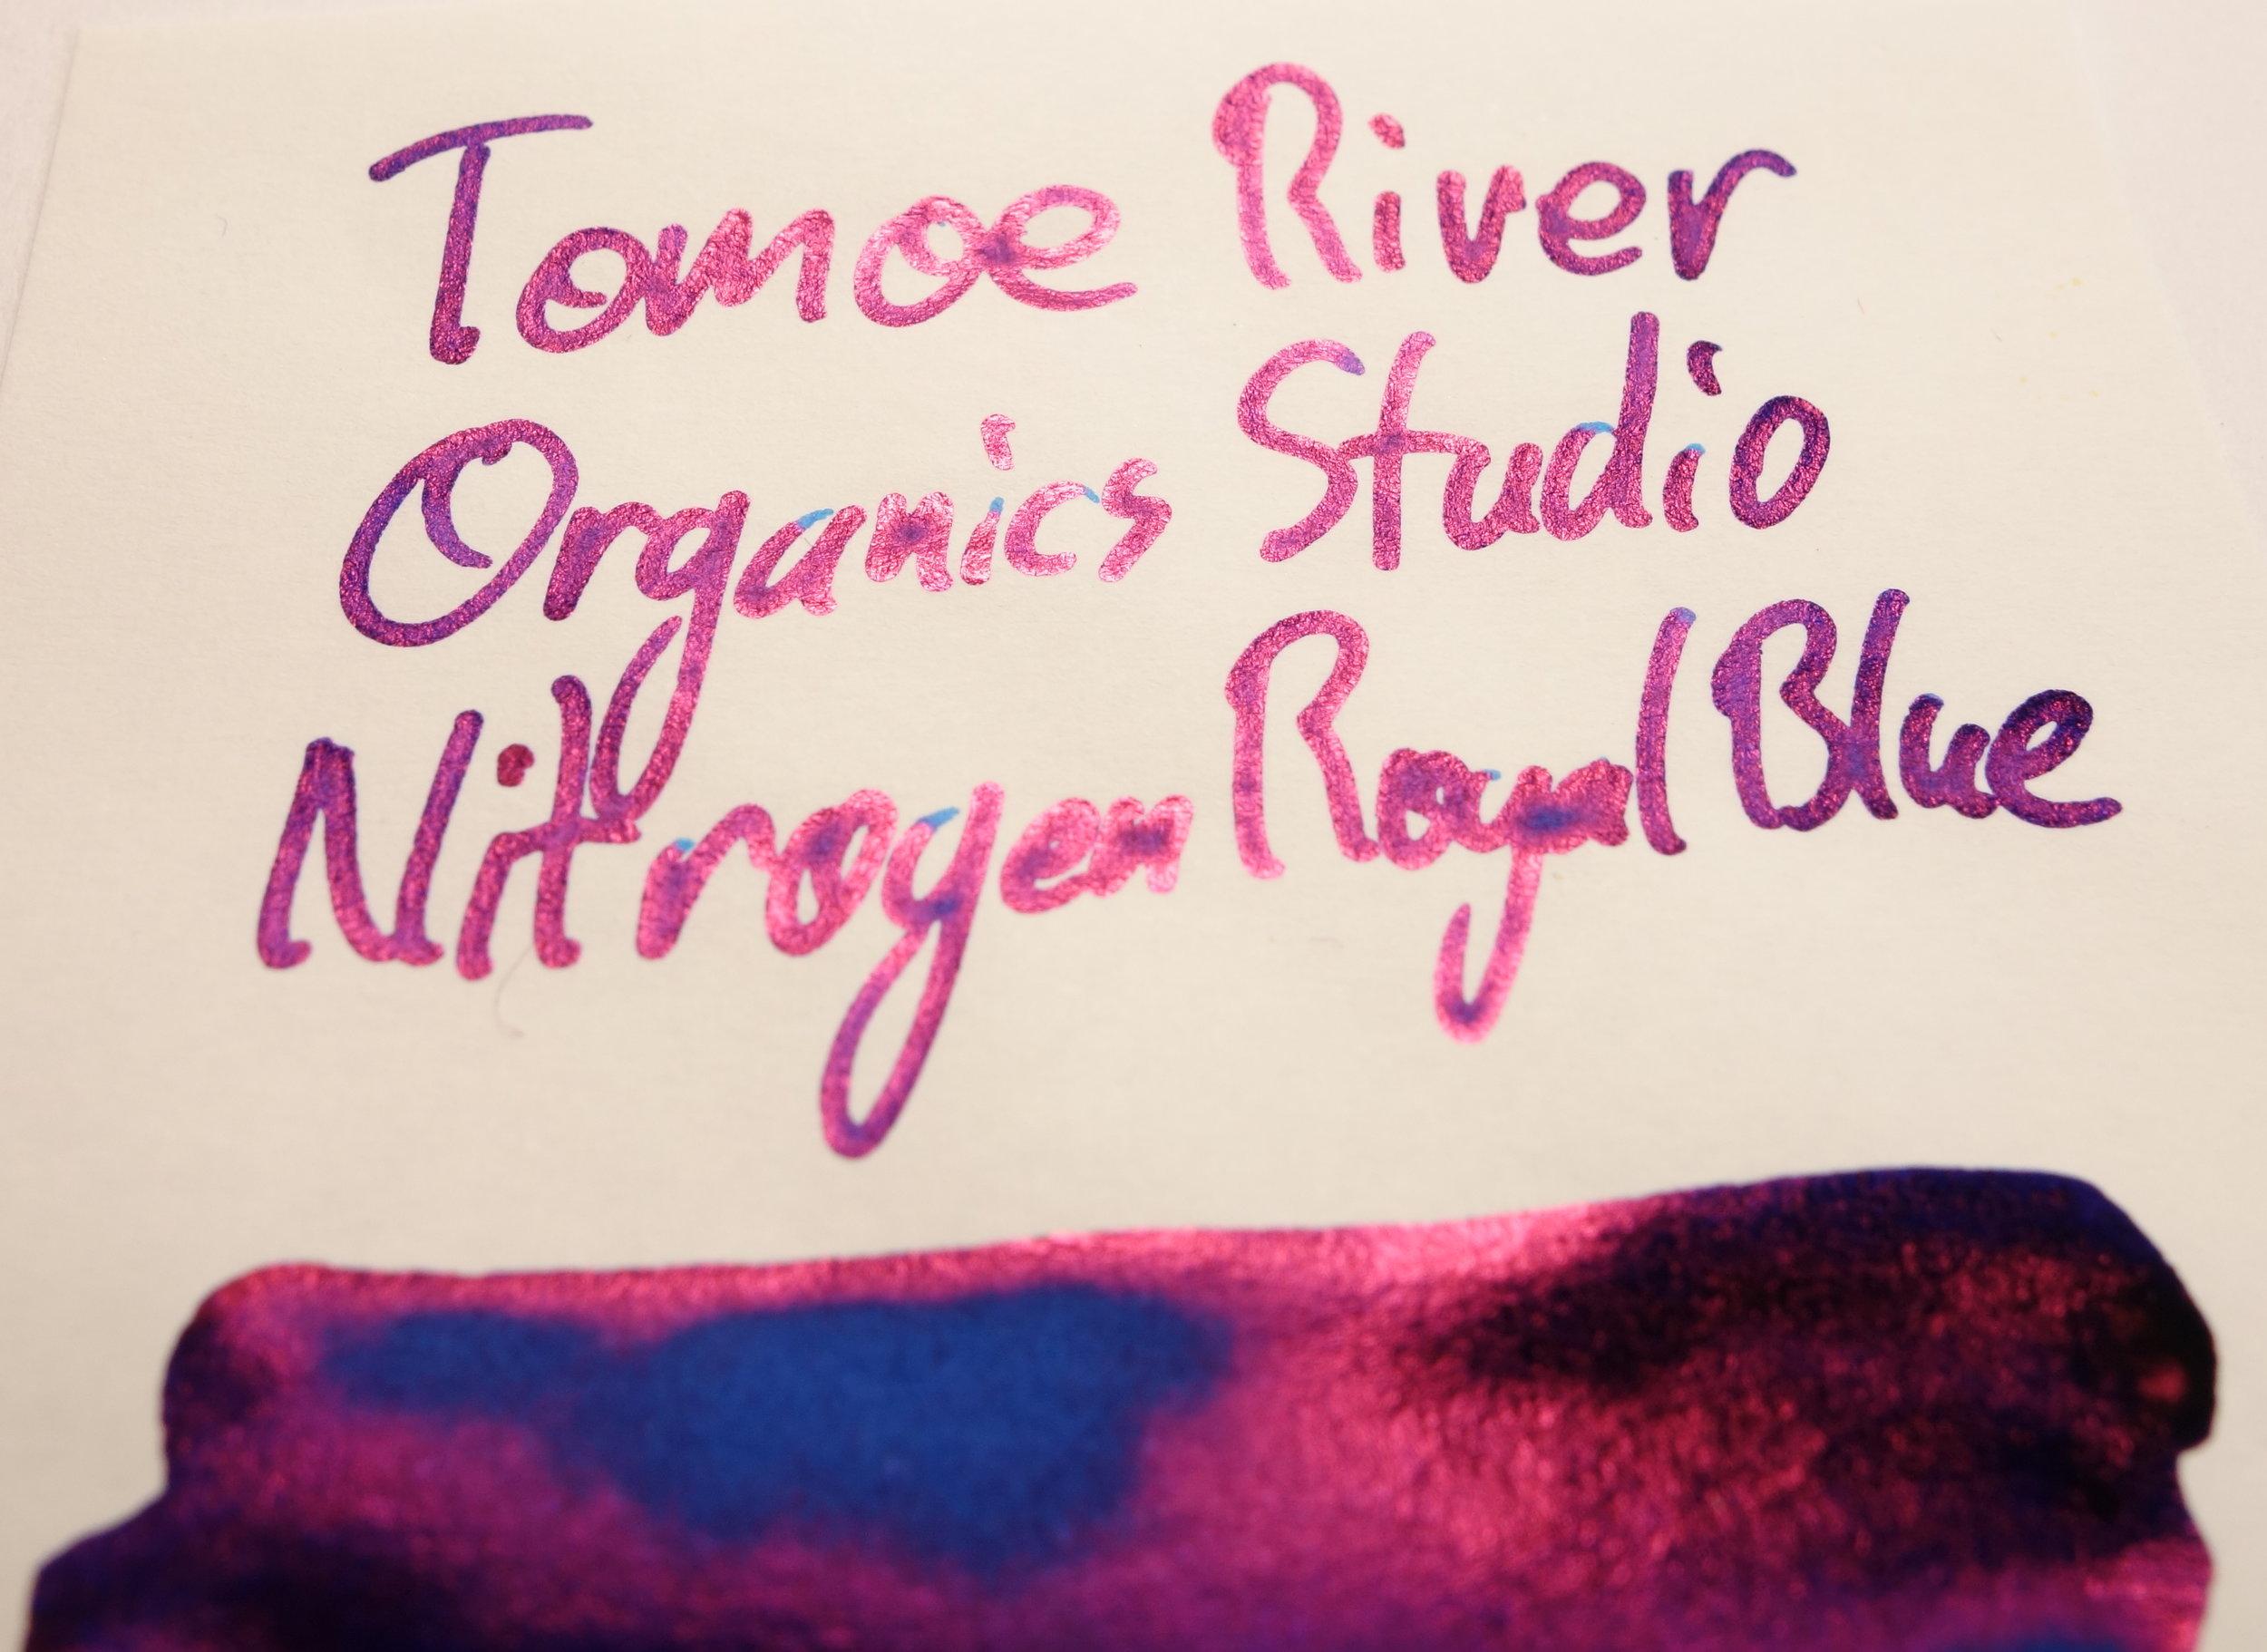 Organics Studio Nitrogen Royal Blue Sheen Tomoe River.JPG